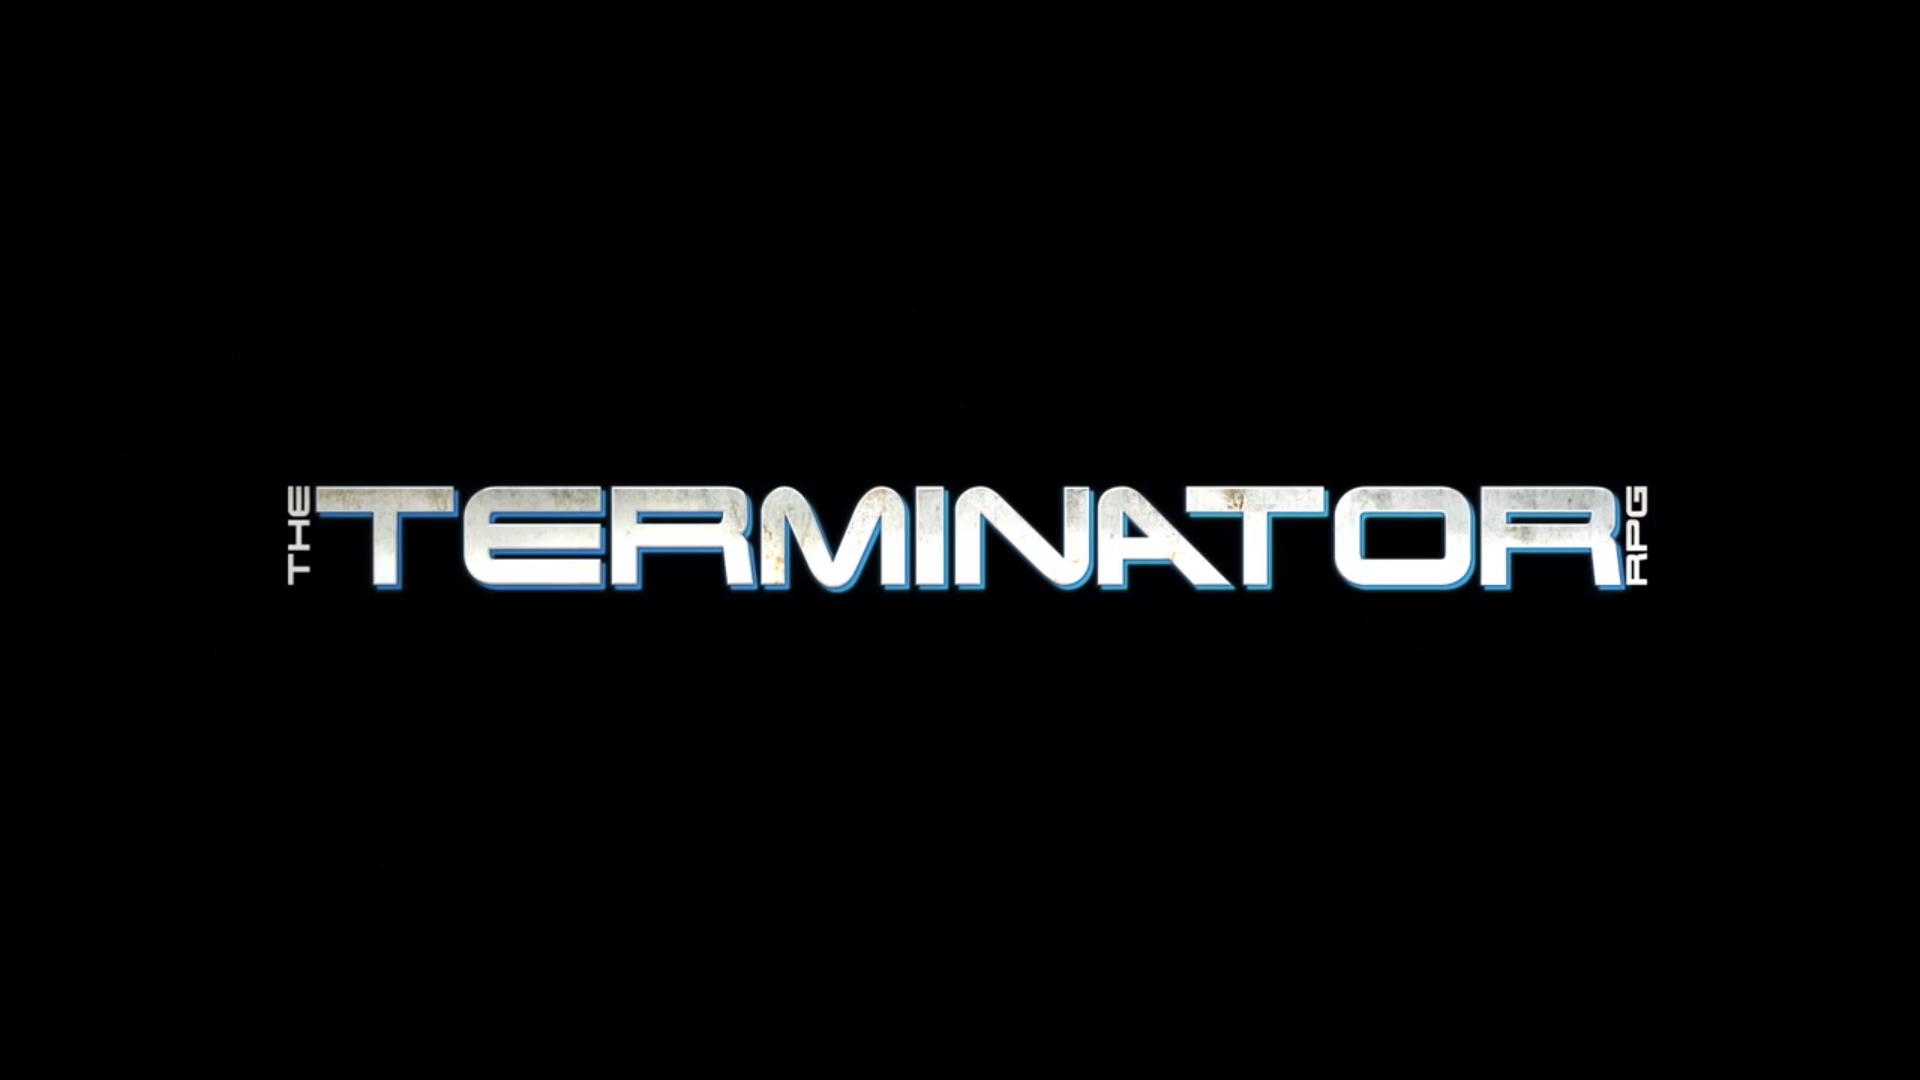 The Terminator RPG Kickstarter